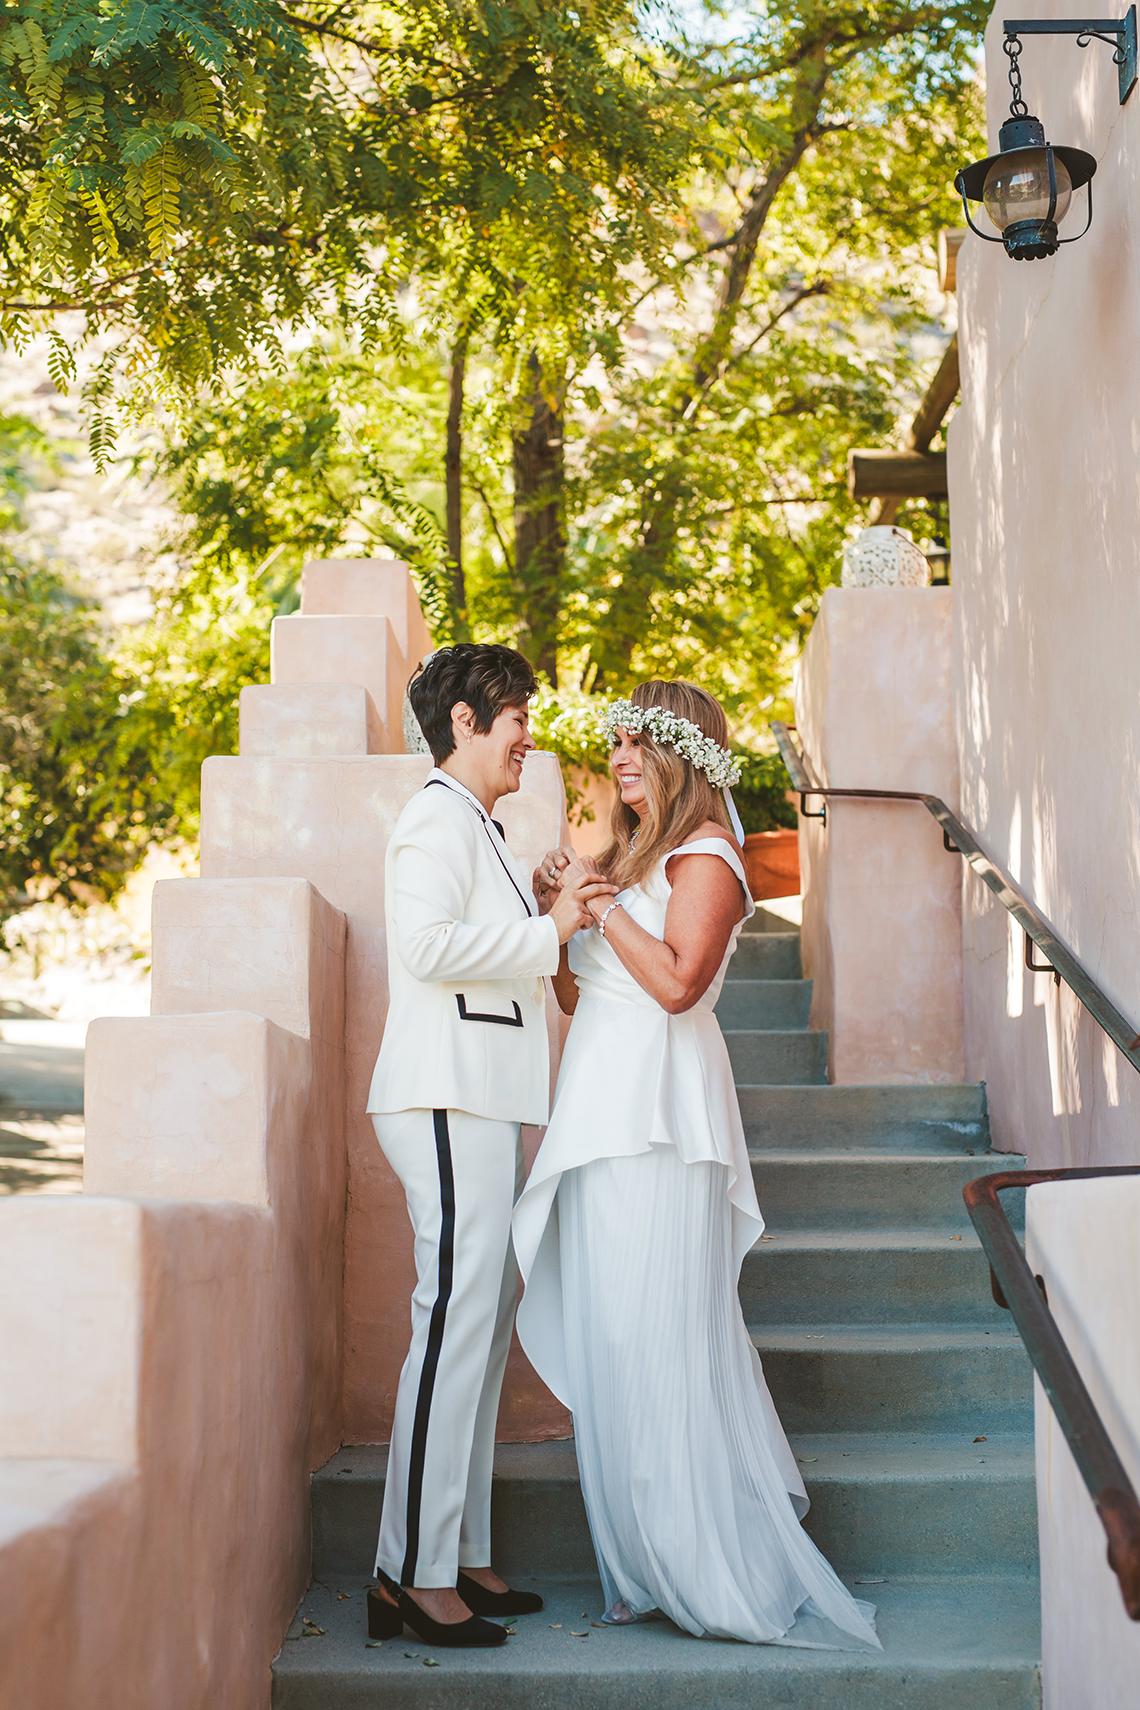 Stylish Same-Sex Palm Springs Wedding – Colony 29 – Ryan Horban Photography 21